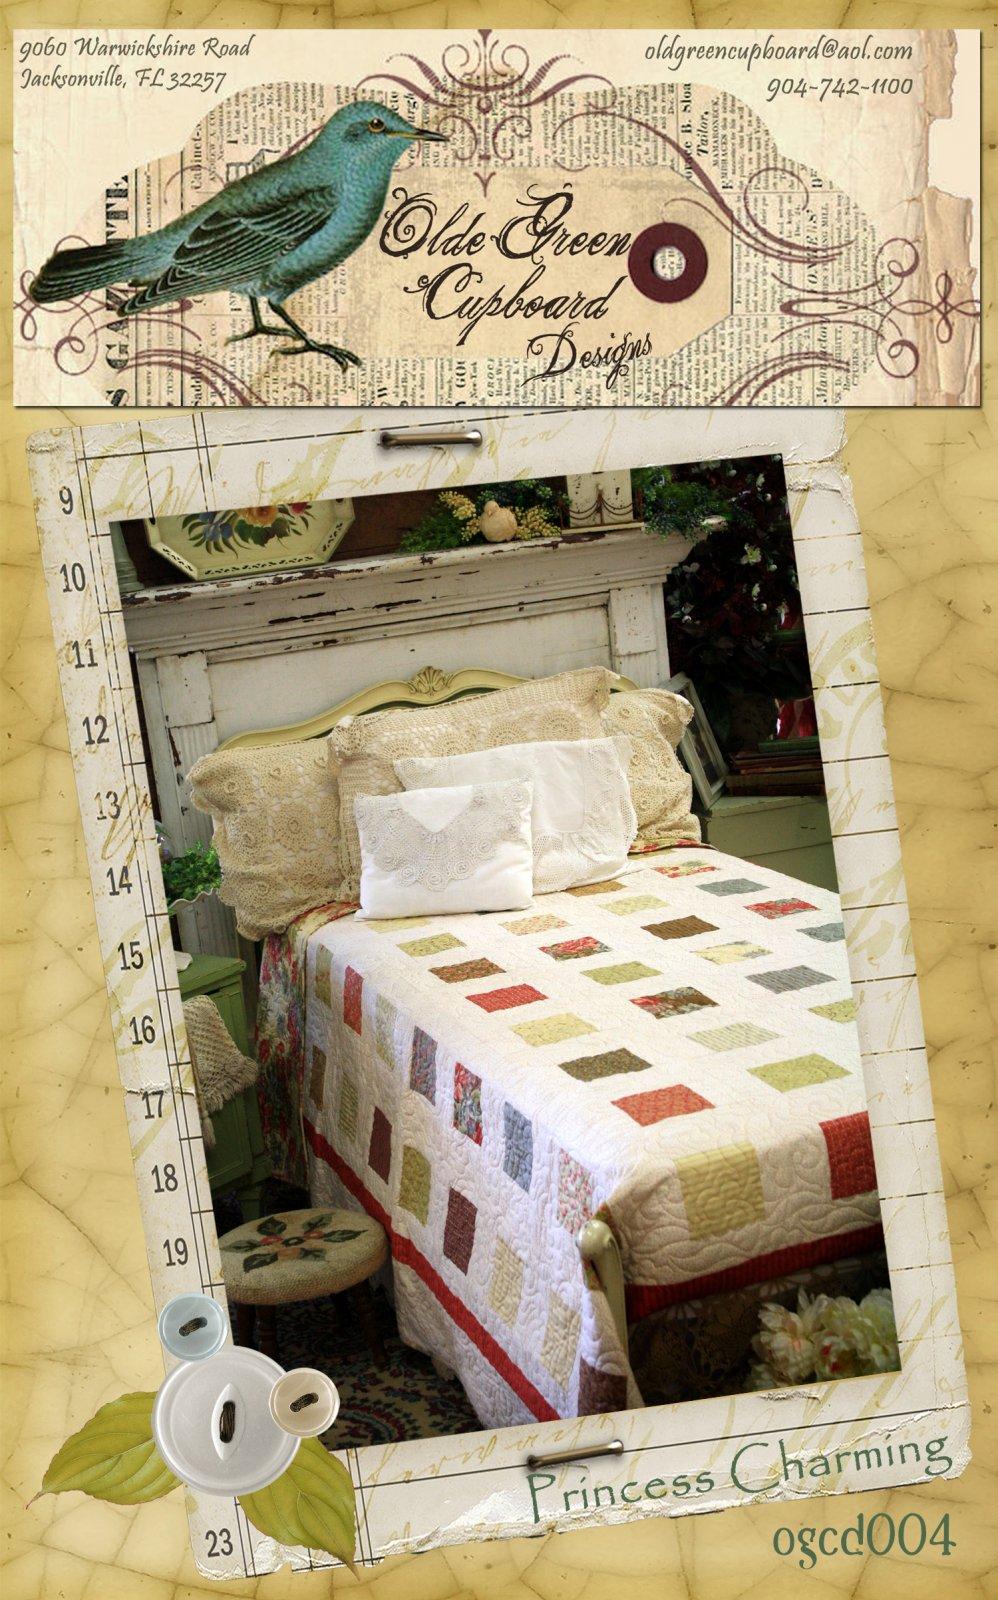 Princess Charming Quilt Pattern - OGCD004